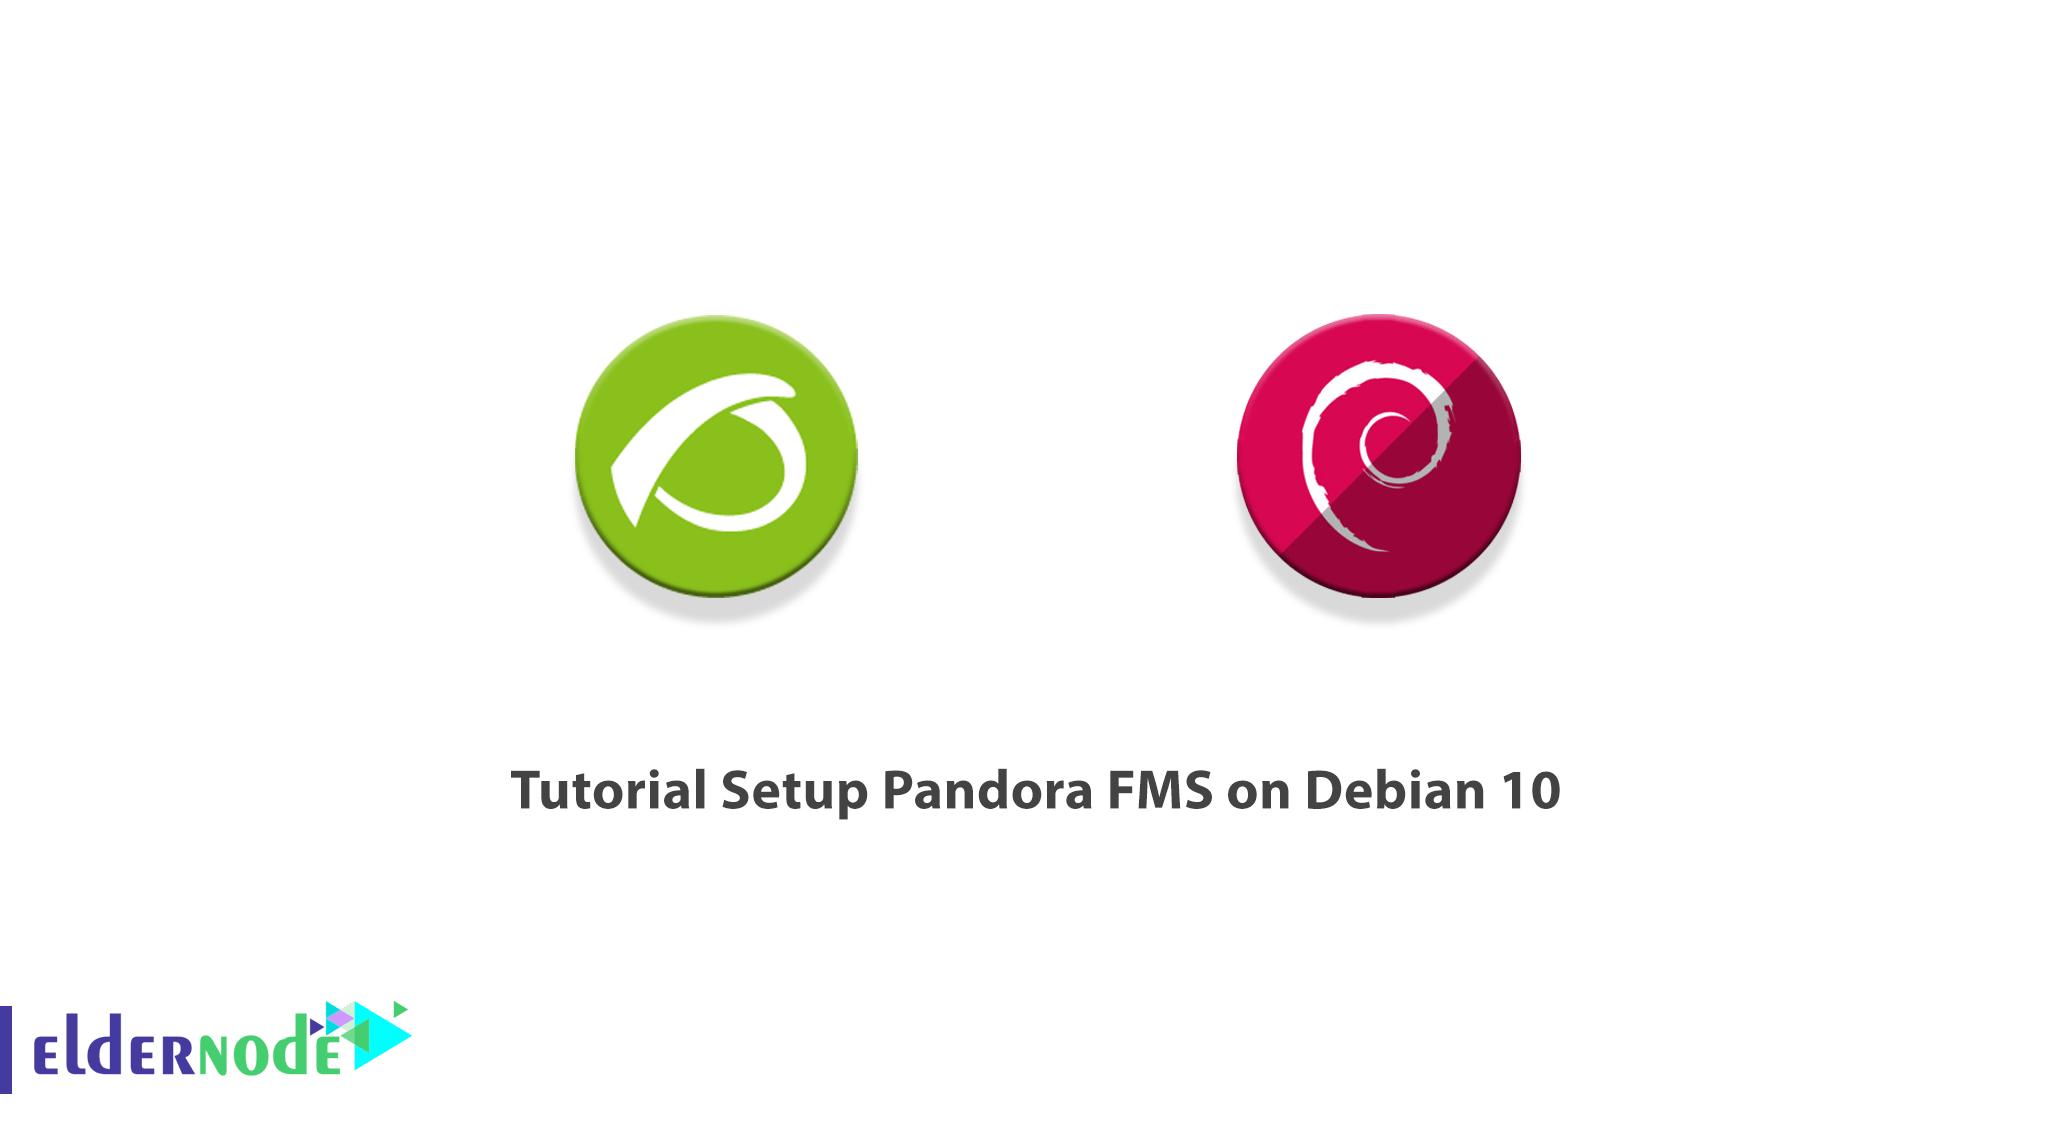 Tutorial Setup Pandora FMS on Debian 10